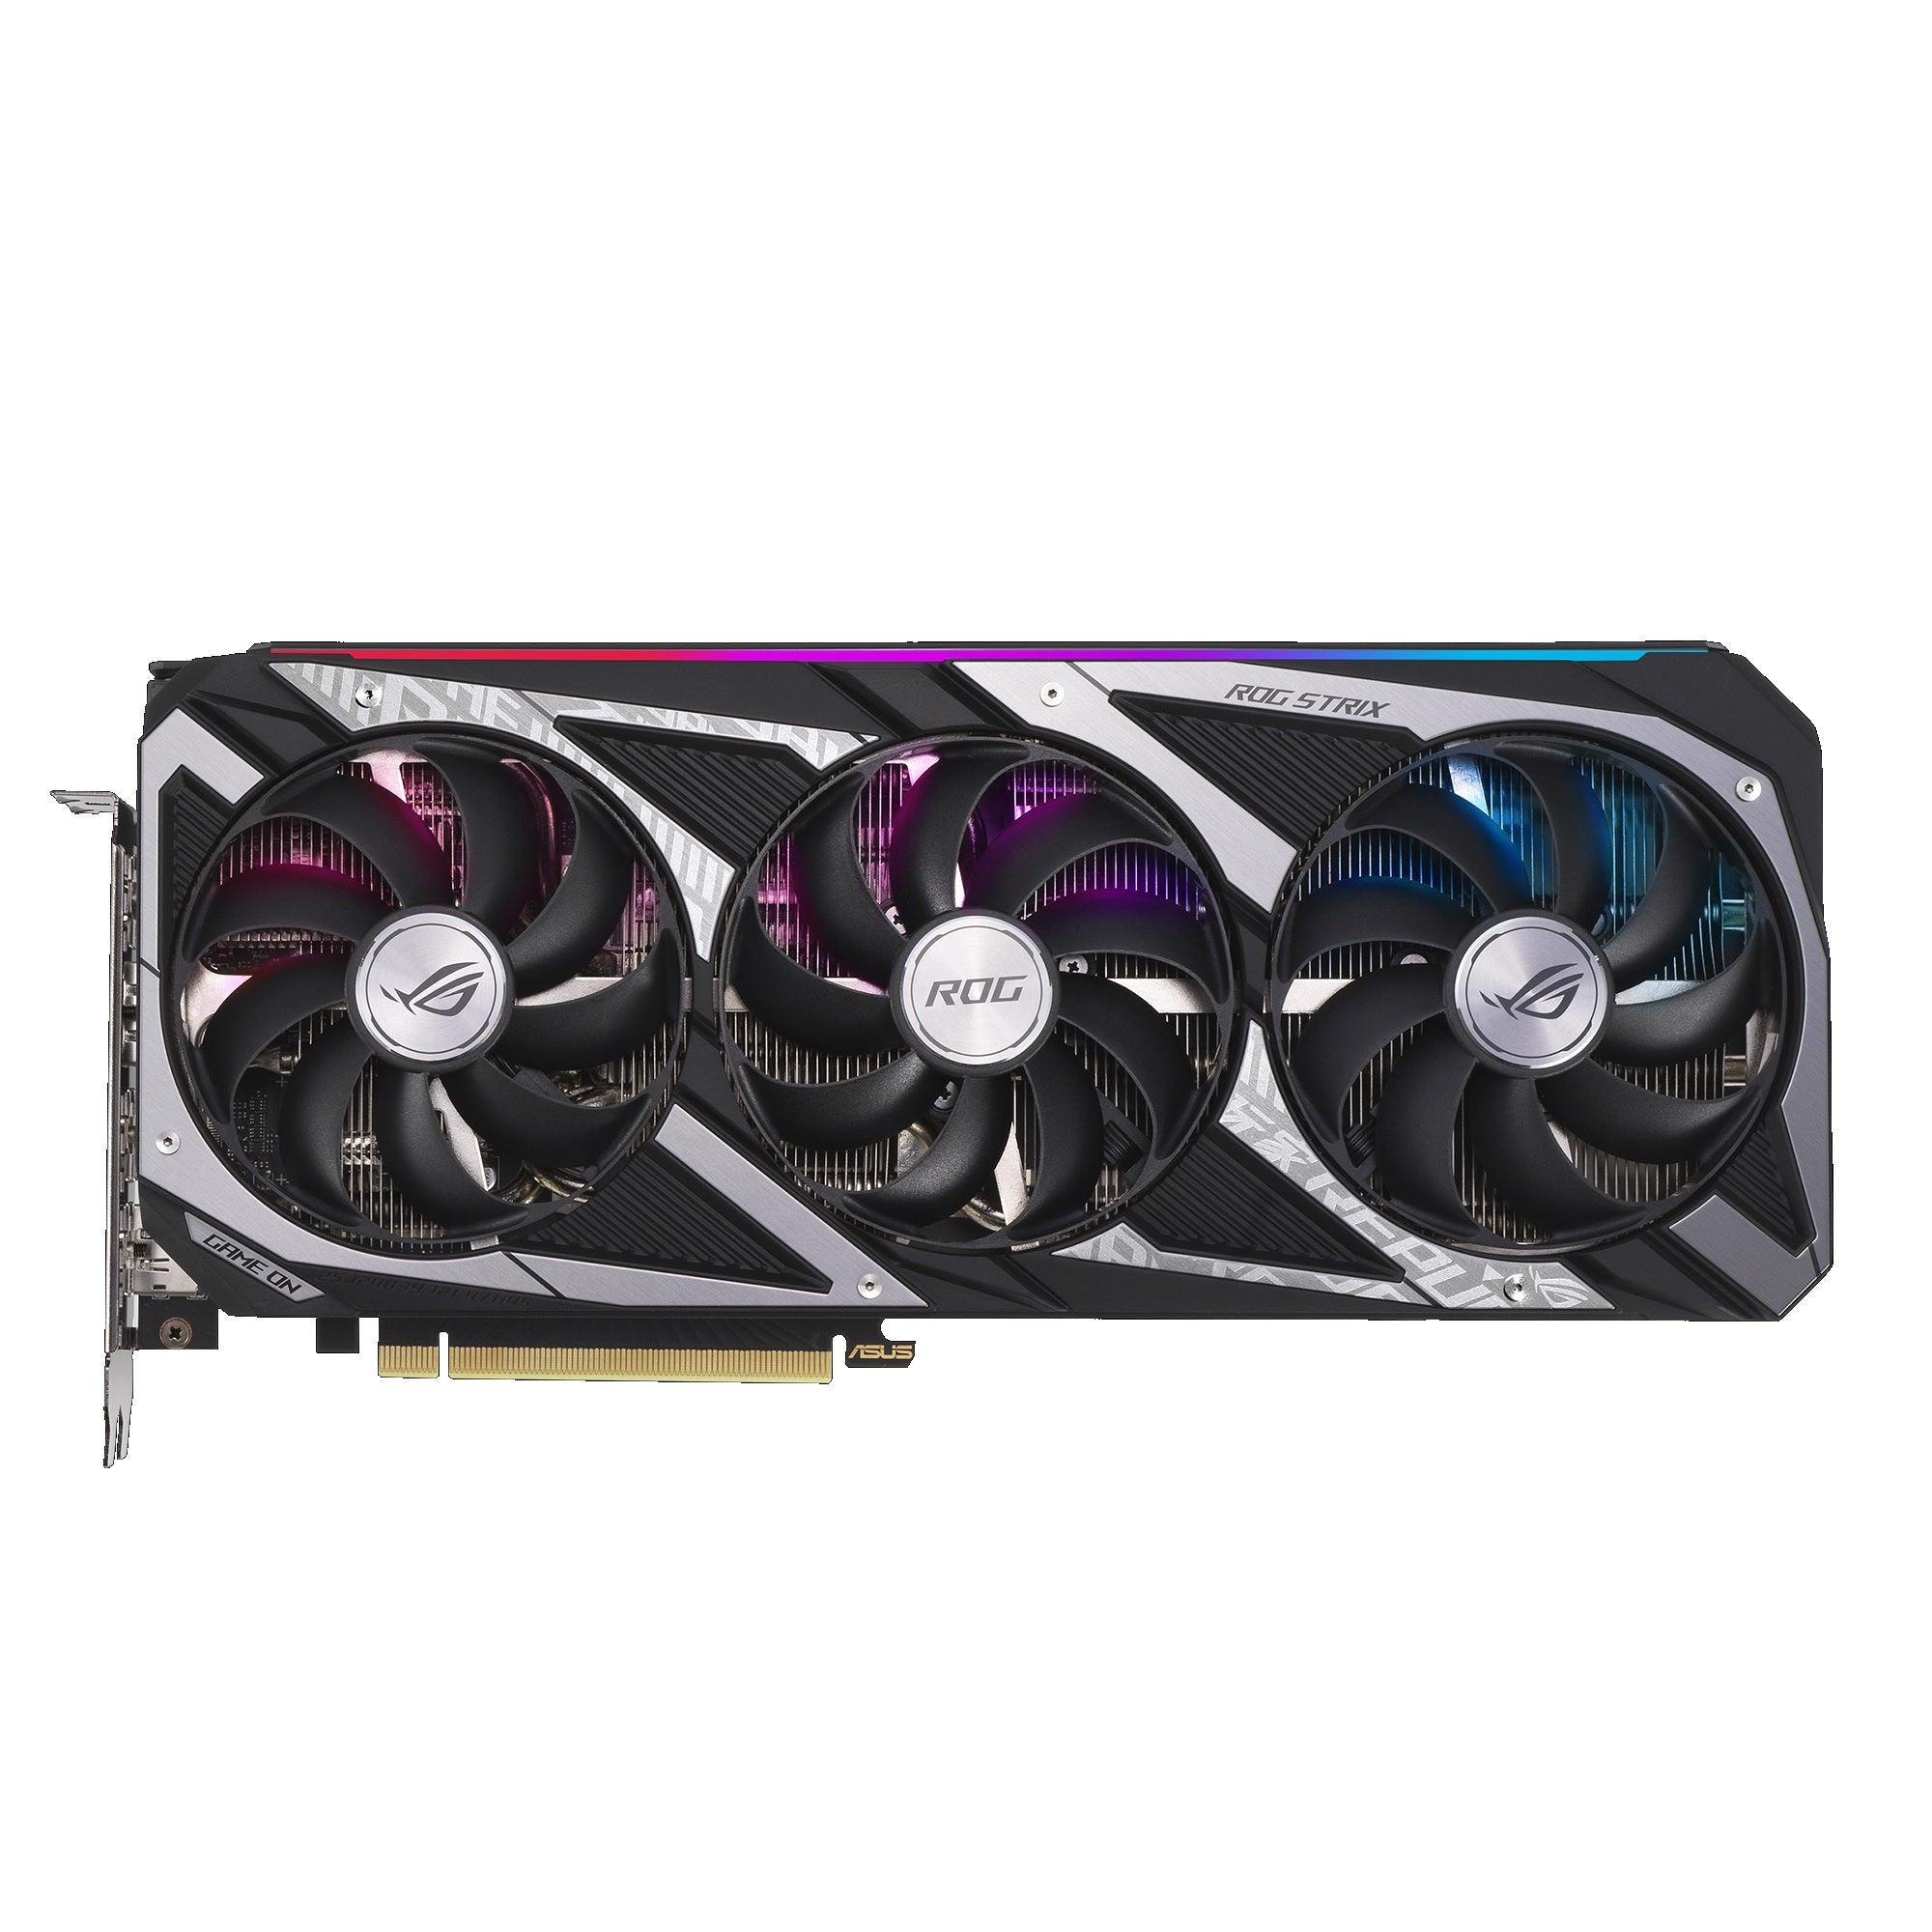 Asus ROG Strix GeForce RTX 3060 V2 OC Edition Graphics Card